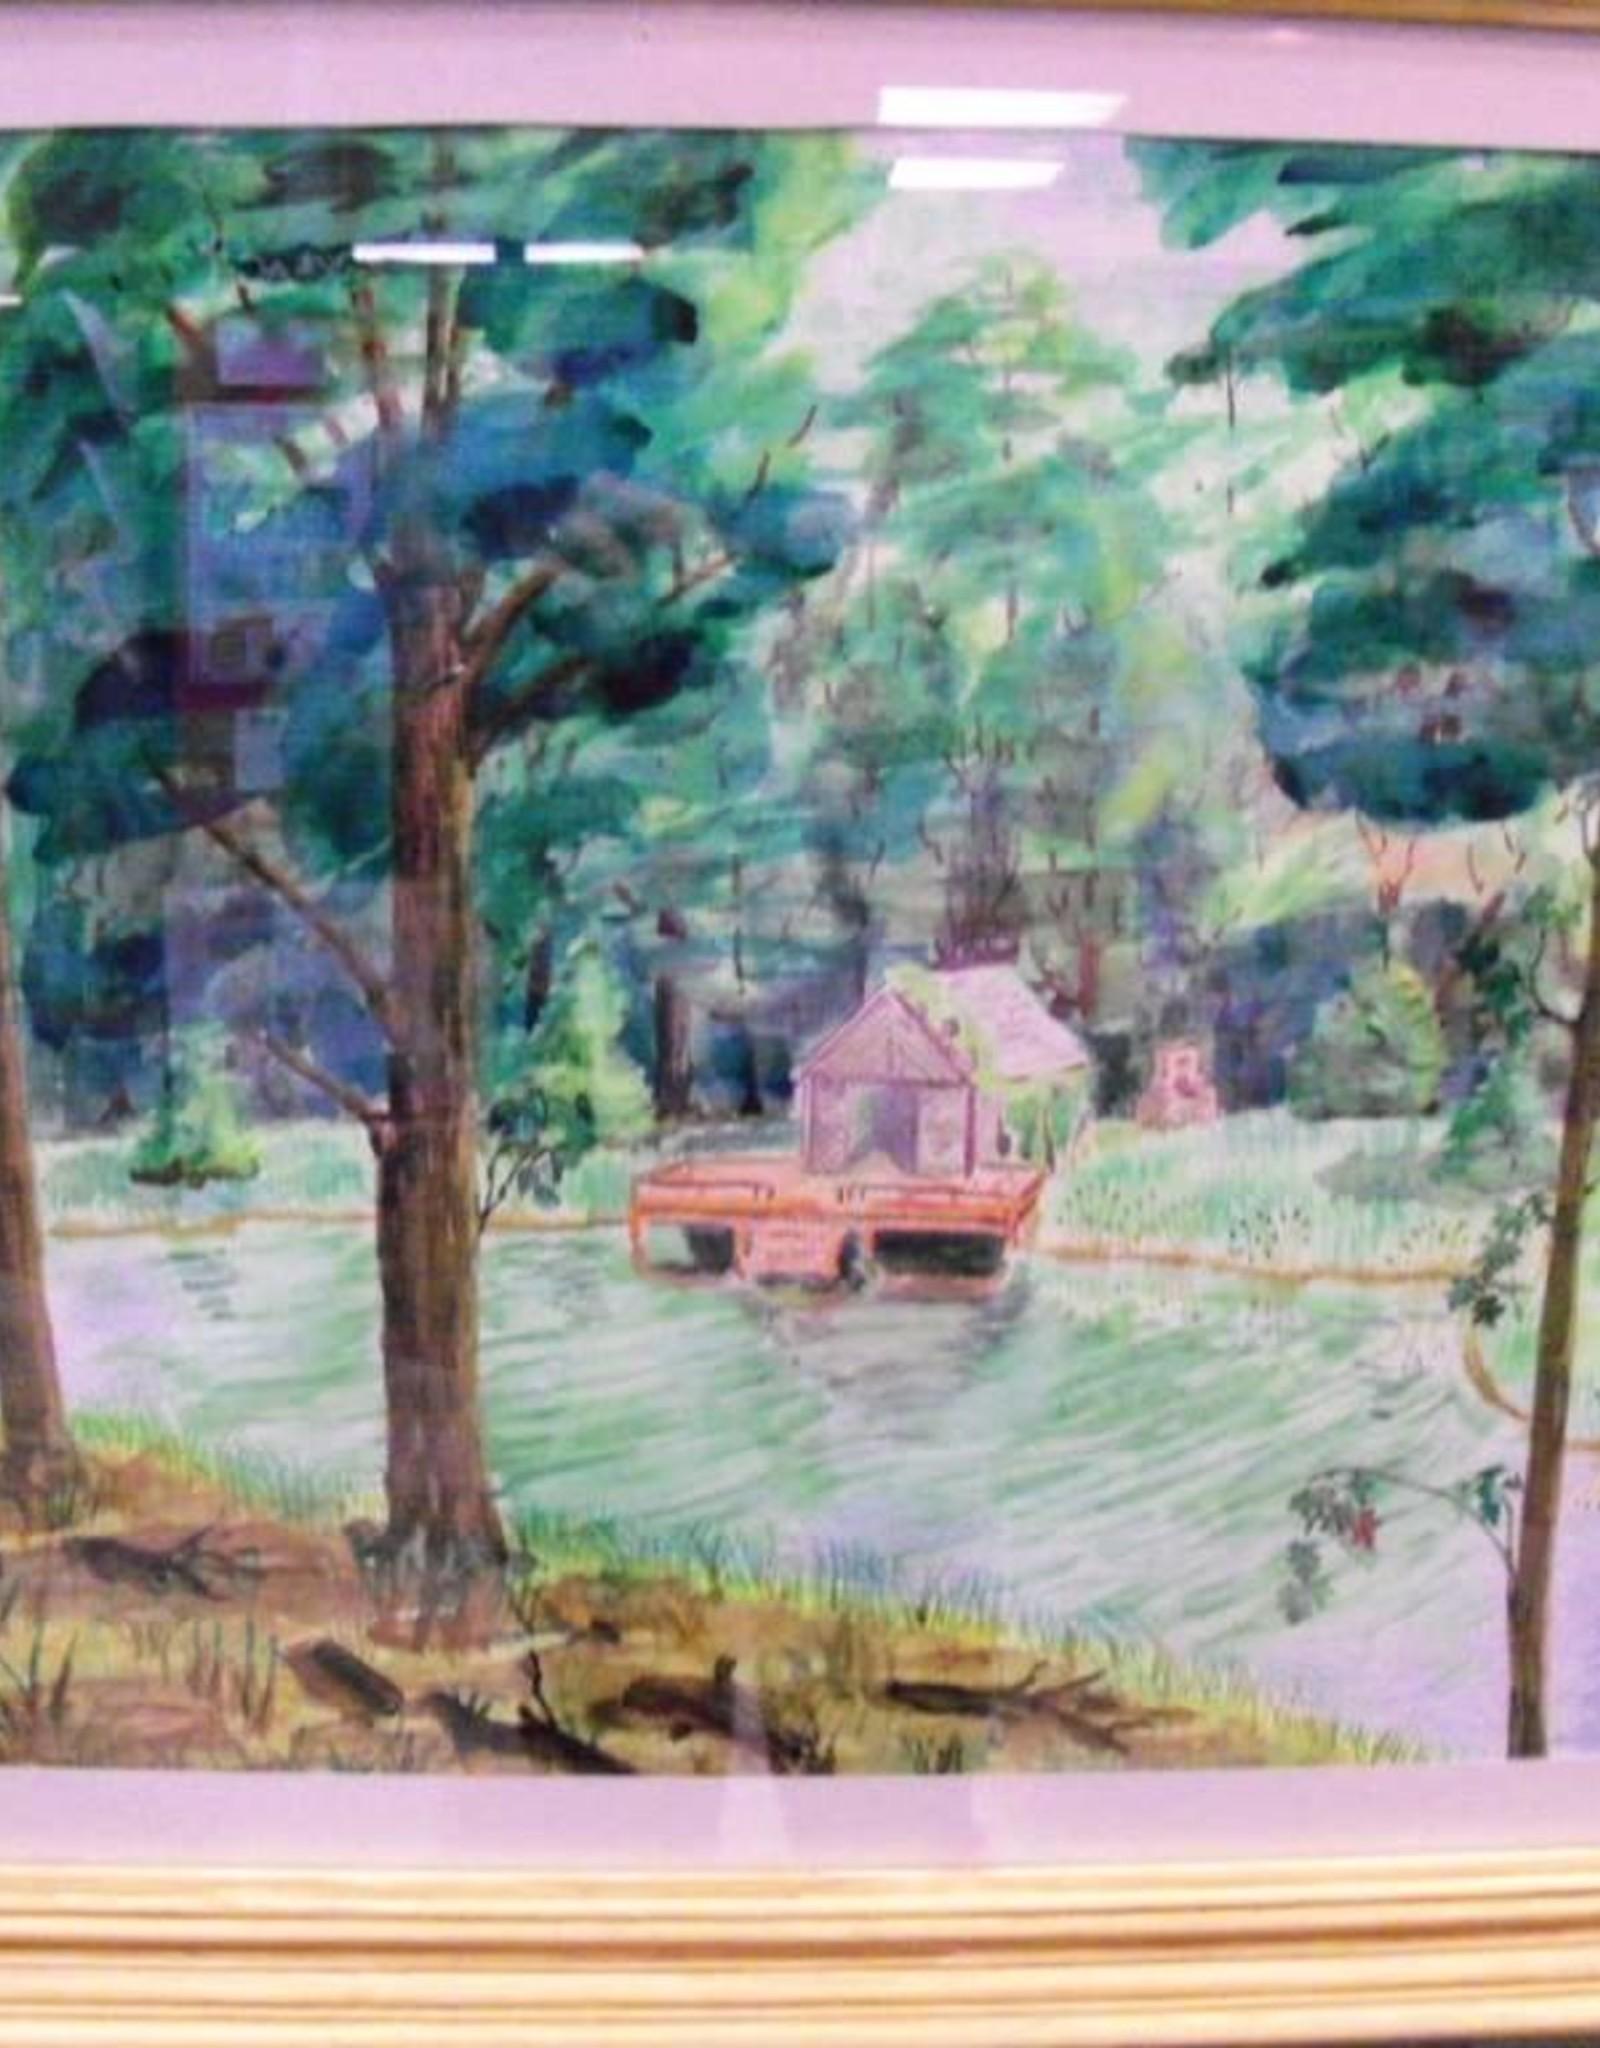 19 - Harry Osman Boat House